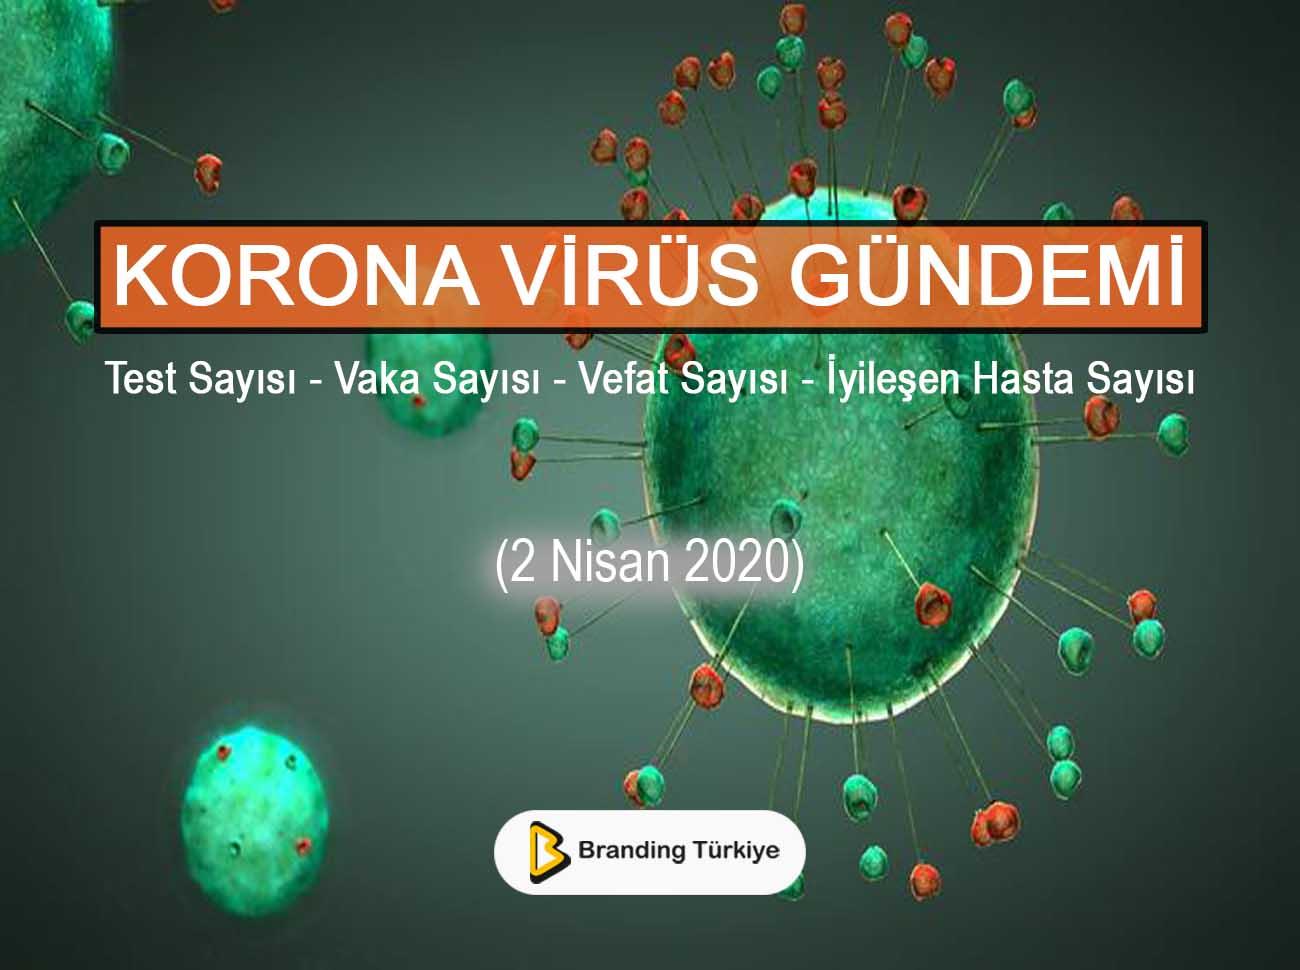 Korona Virüs Gündemi (2 Nisan 2020)